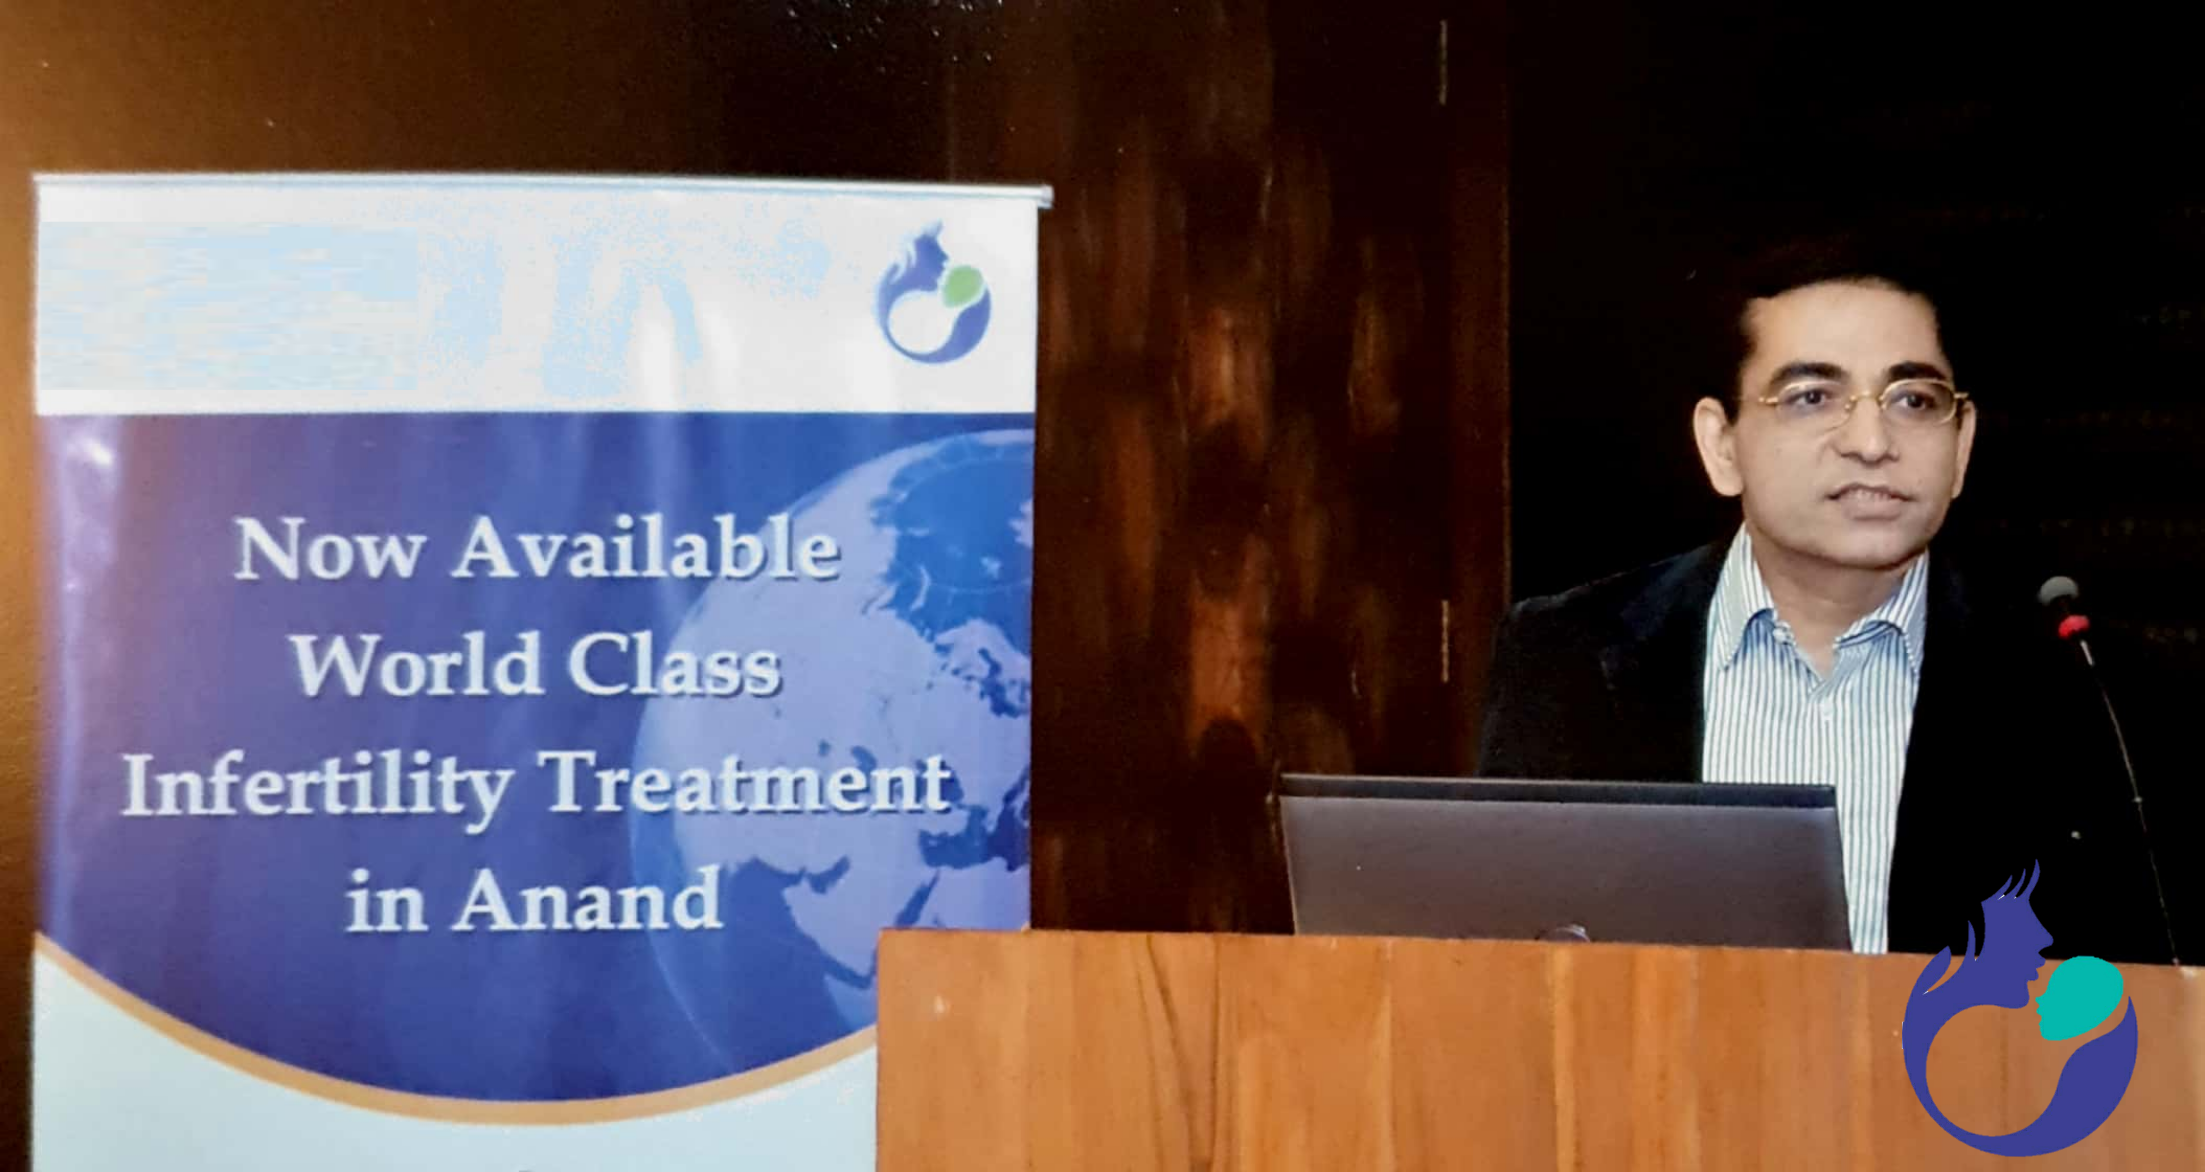 Infertility treatment at Gujarat, IndiaLow Cost IVF Treatment in Gujarat